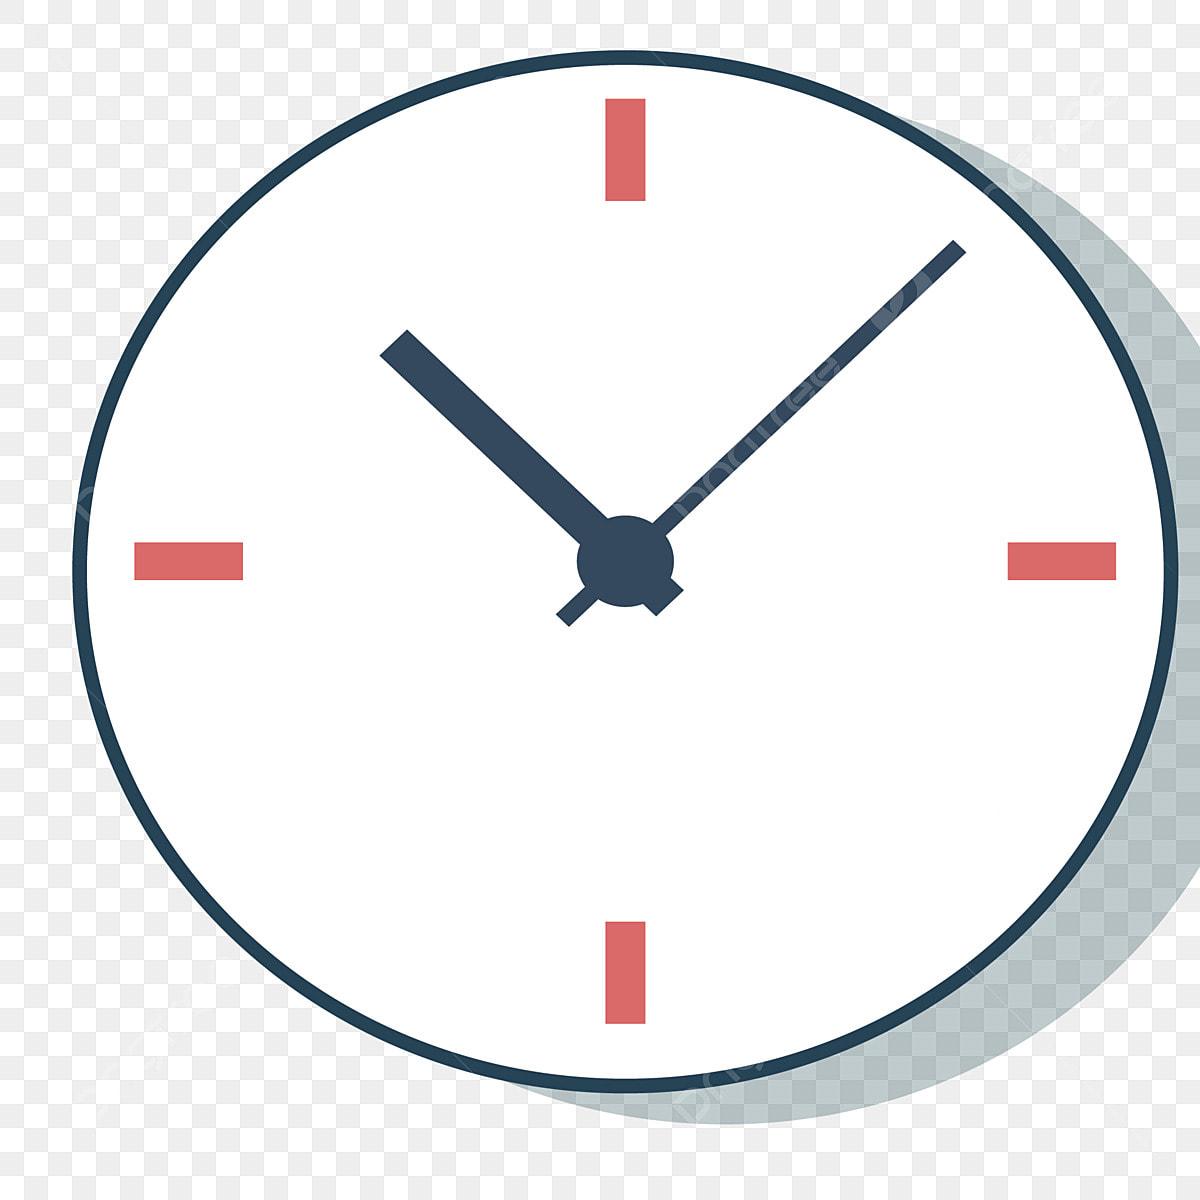 Free clock clipart - Cliparting.com